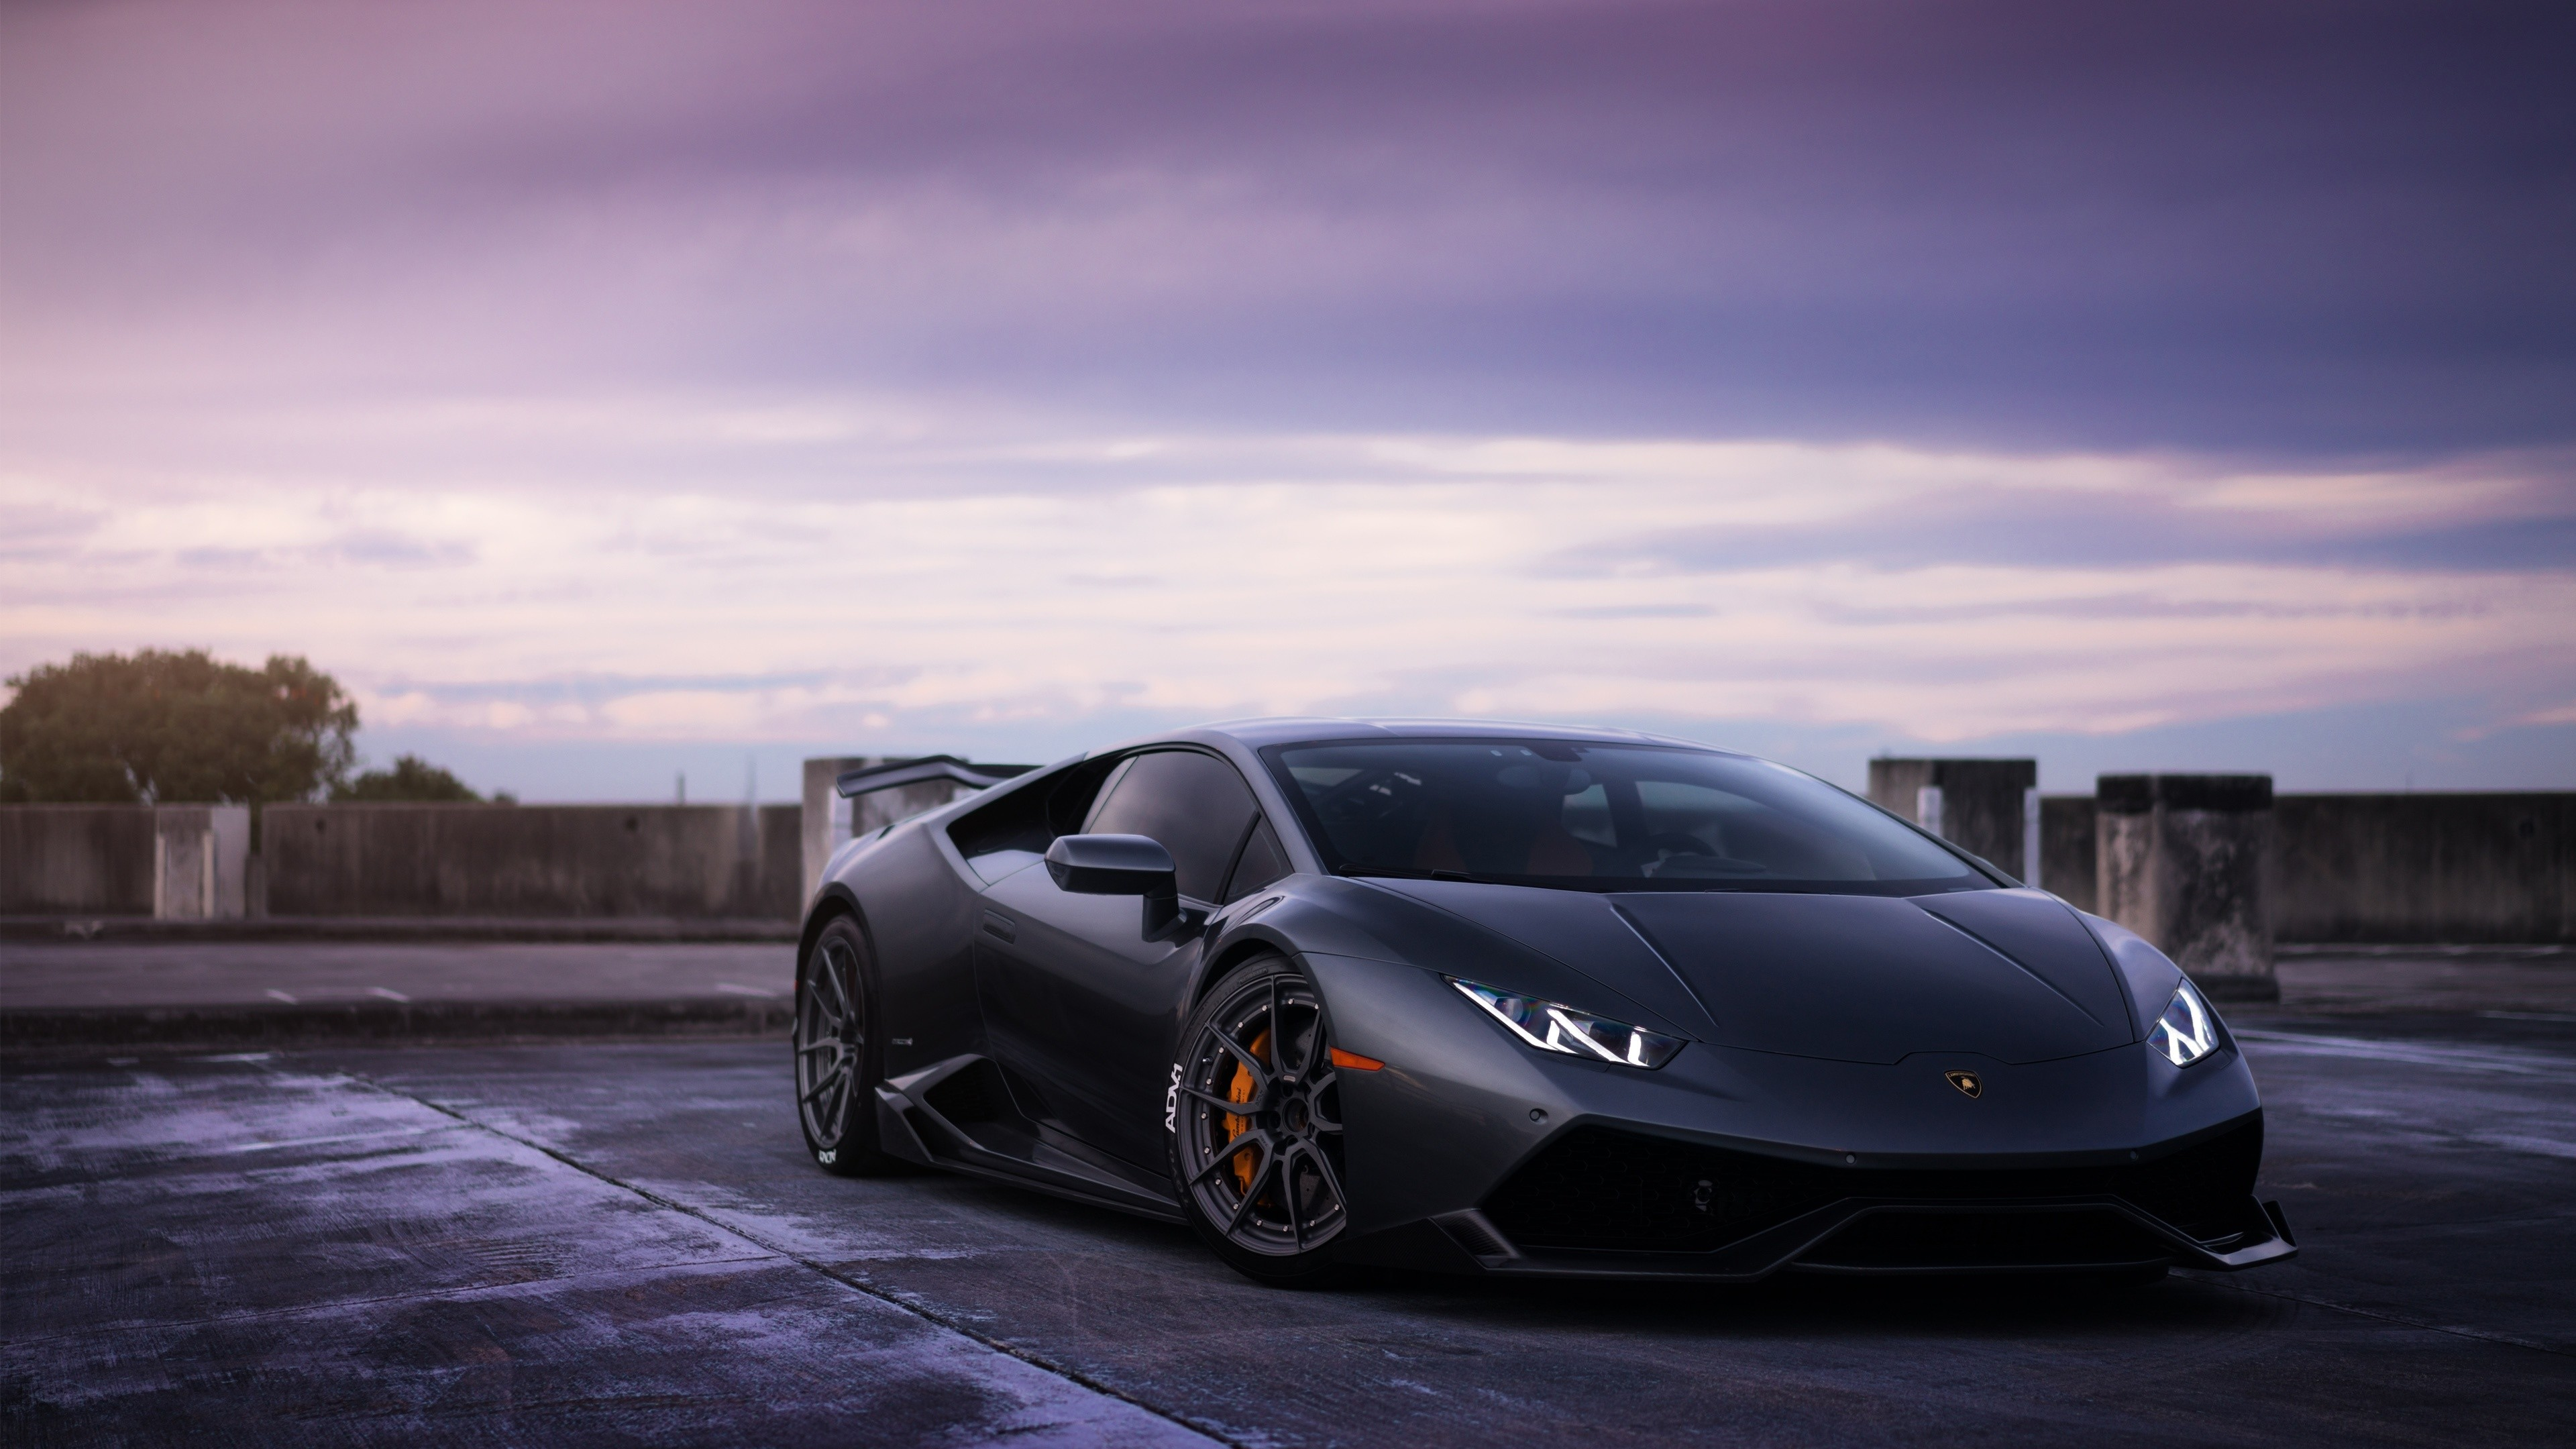 … Lamborghini Huracan on ADV1 wheels 3 Wallpaper HD Car Wallpapers